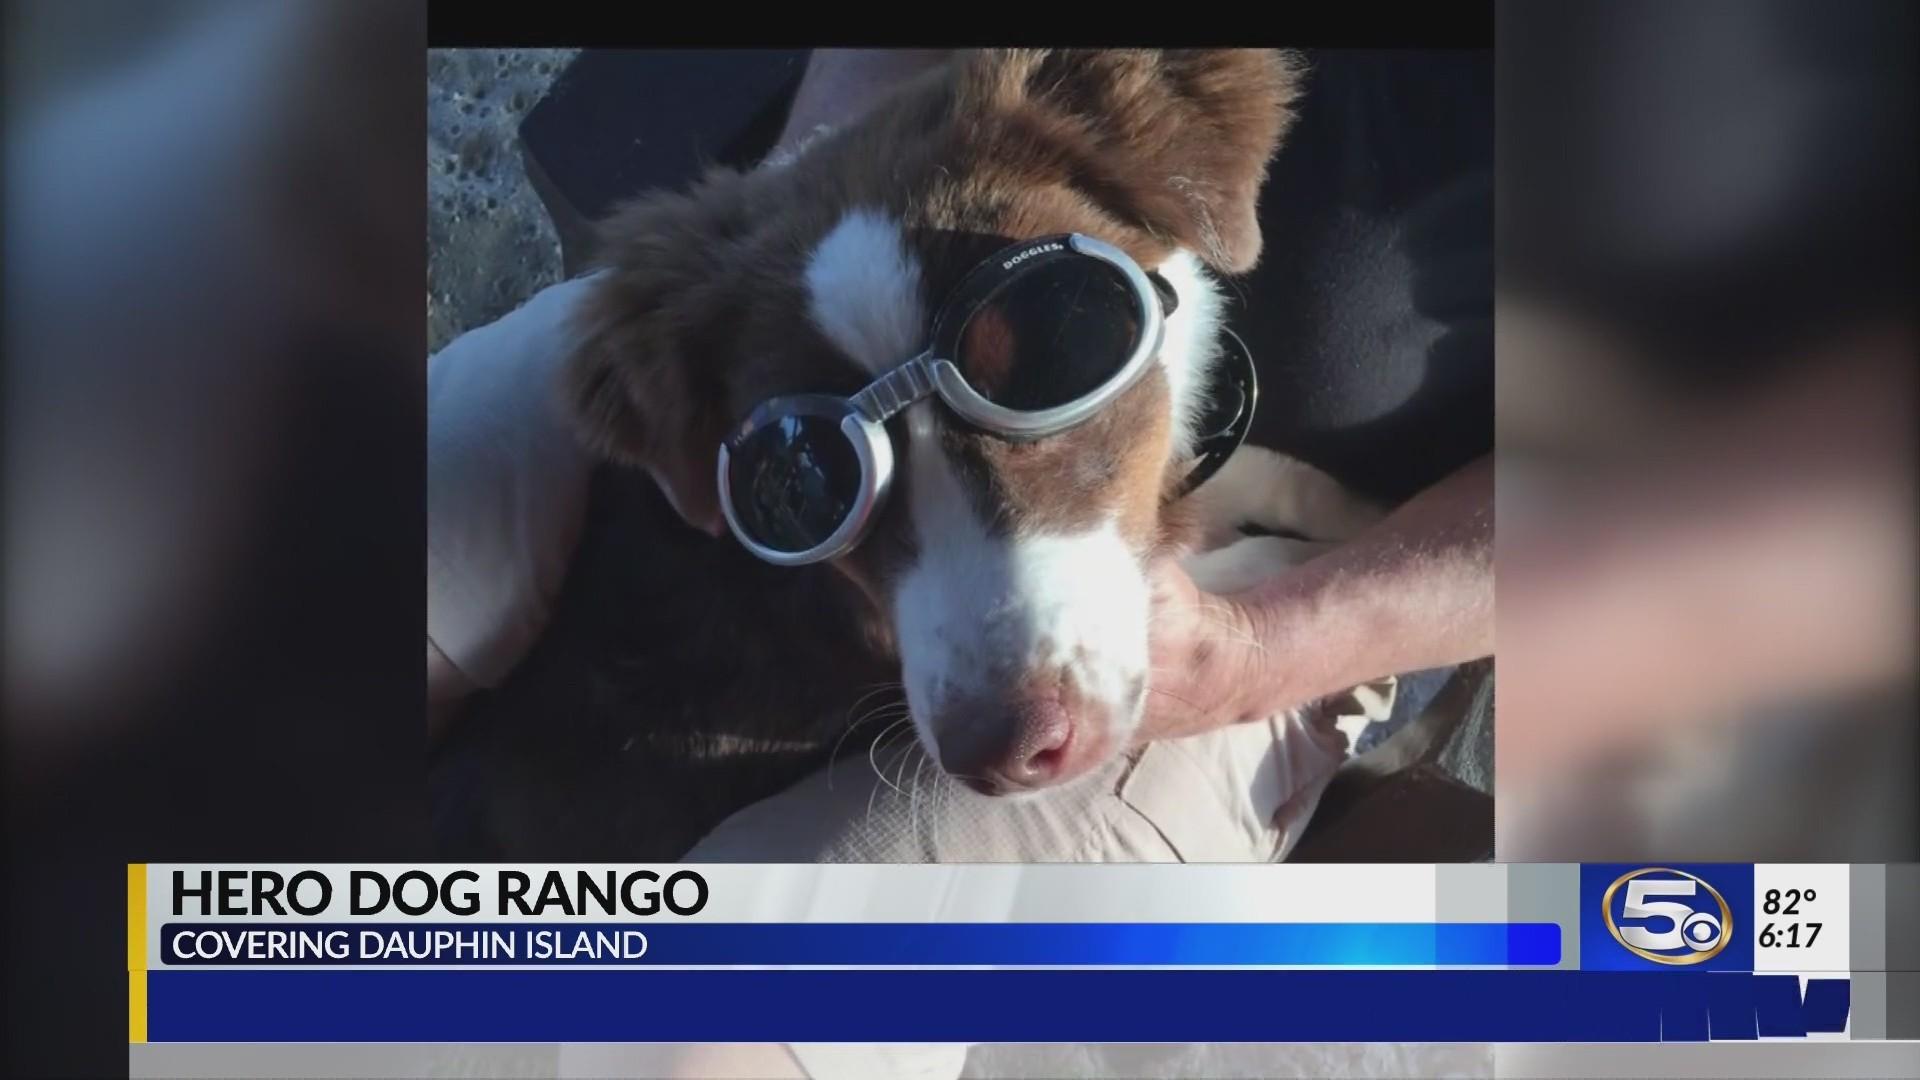 VIDEO:  Rango, Dauphin Island's alert hero dog